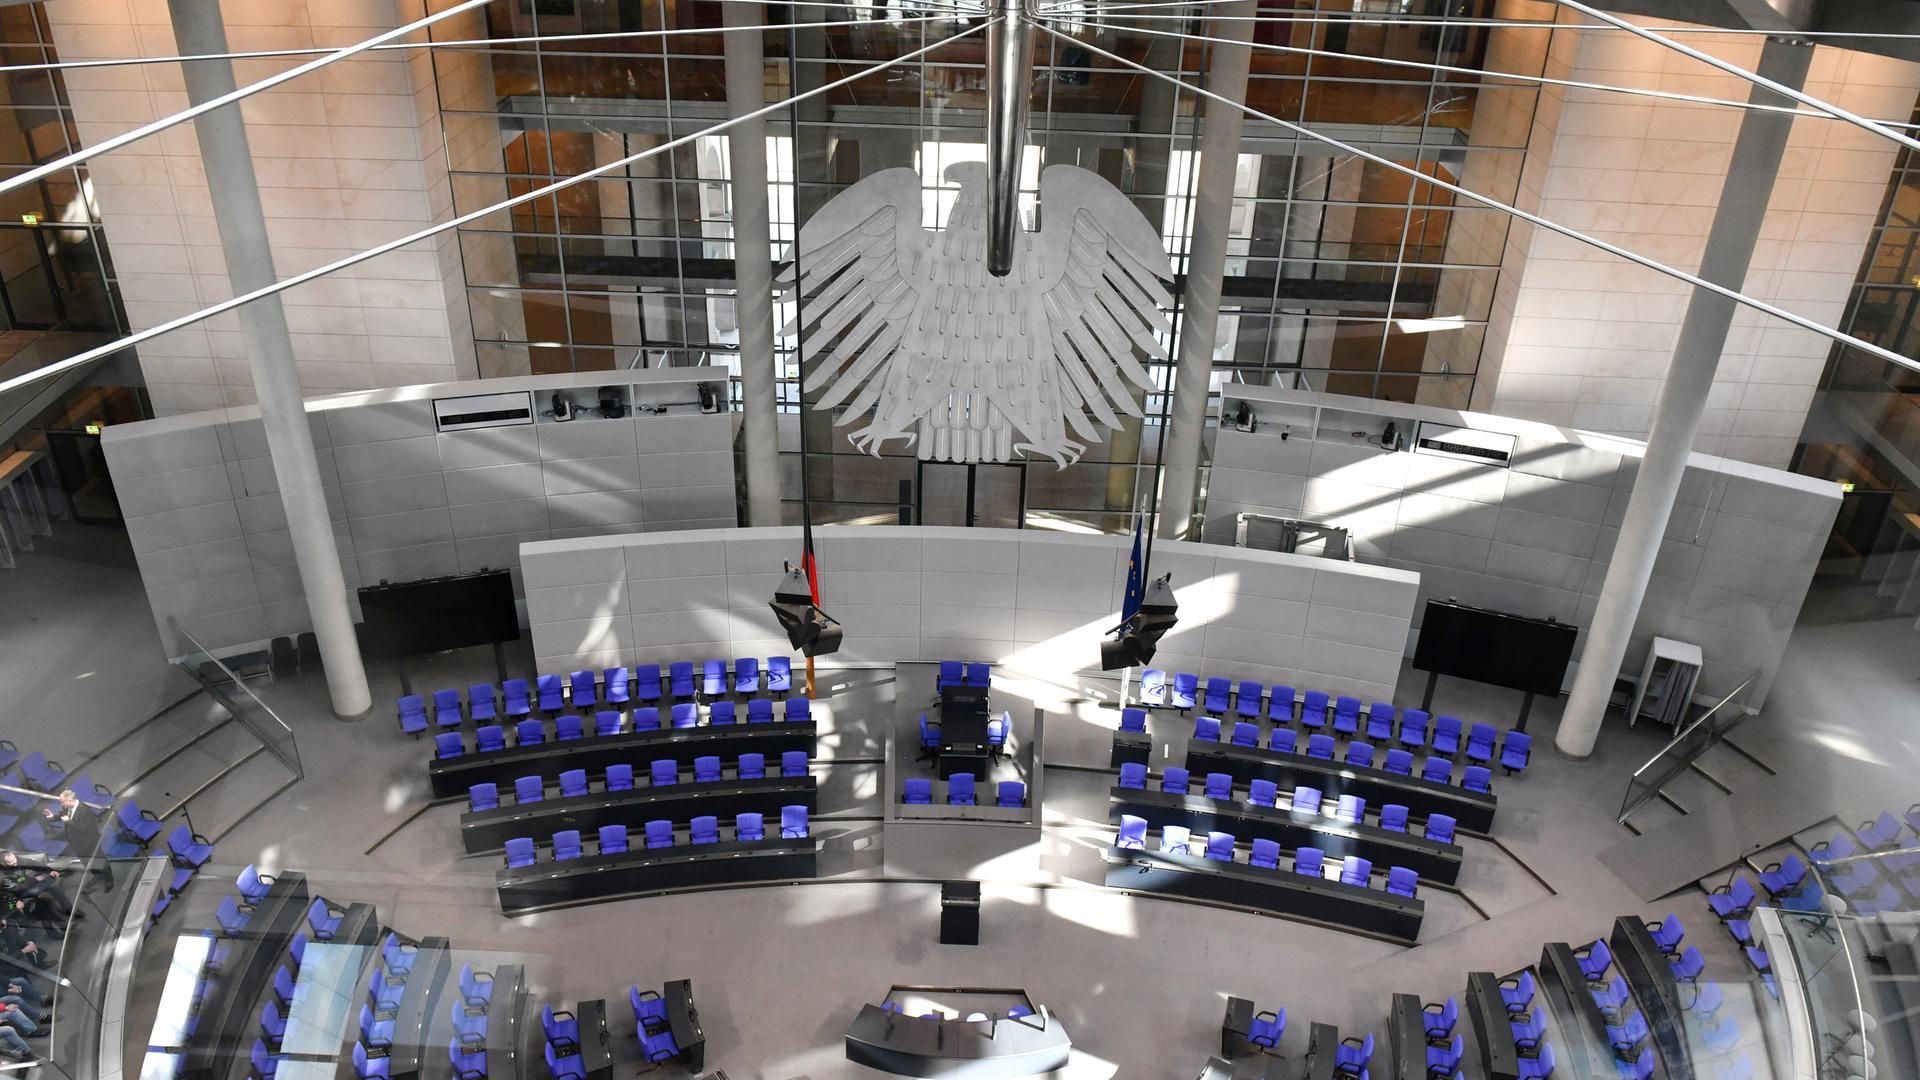 Wunderbar Leere Probe Fortsetzen Bilder - Entry Level Resume ...